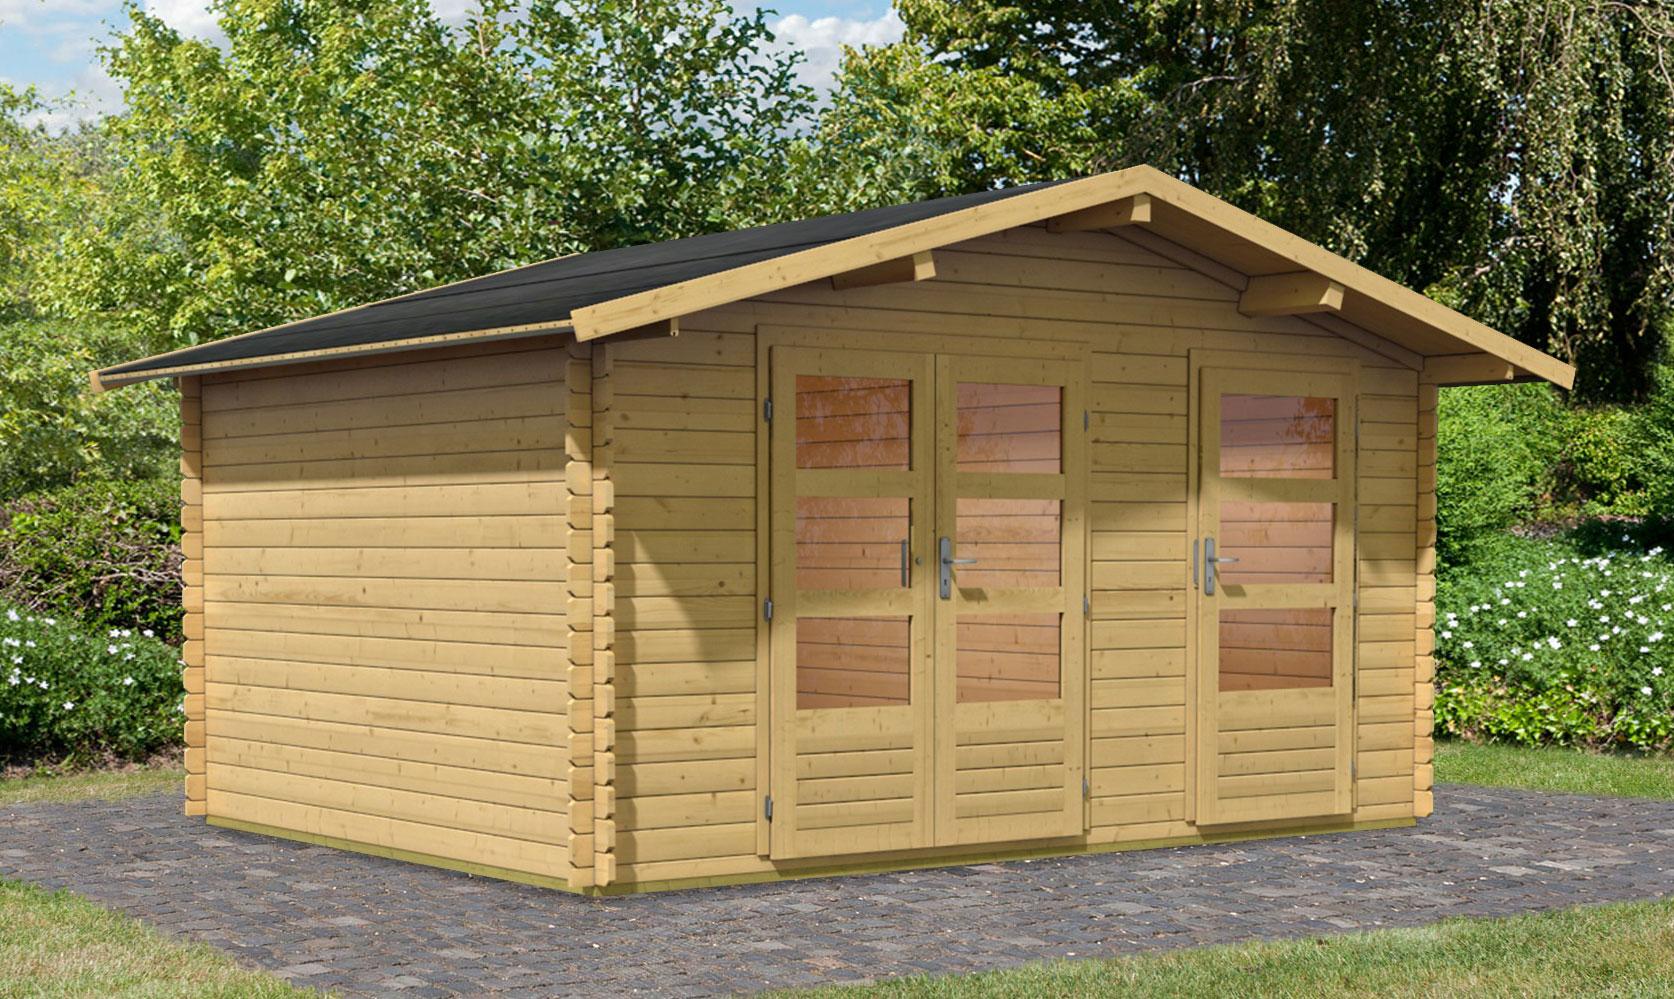 woodfeeling gartenhaus 28 mm radur 1 natur 417x327cm bei. Black Bedroom Furniture Sets. Home Design Ideas